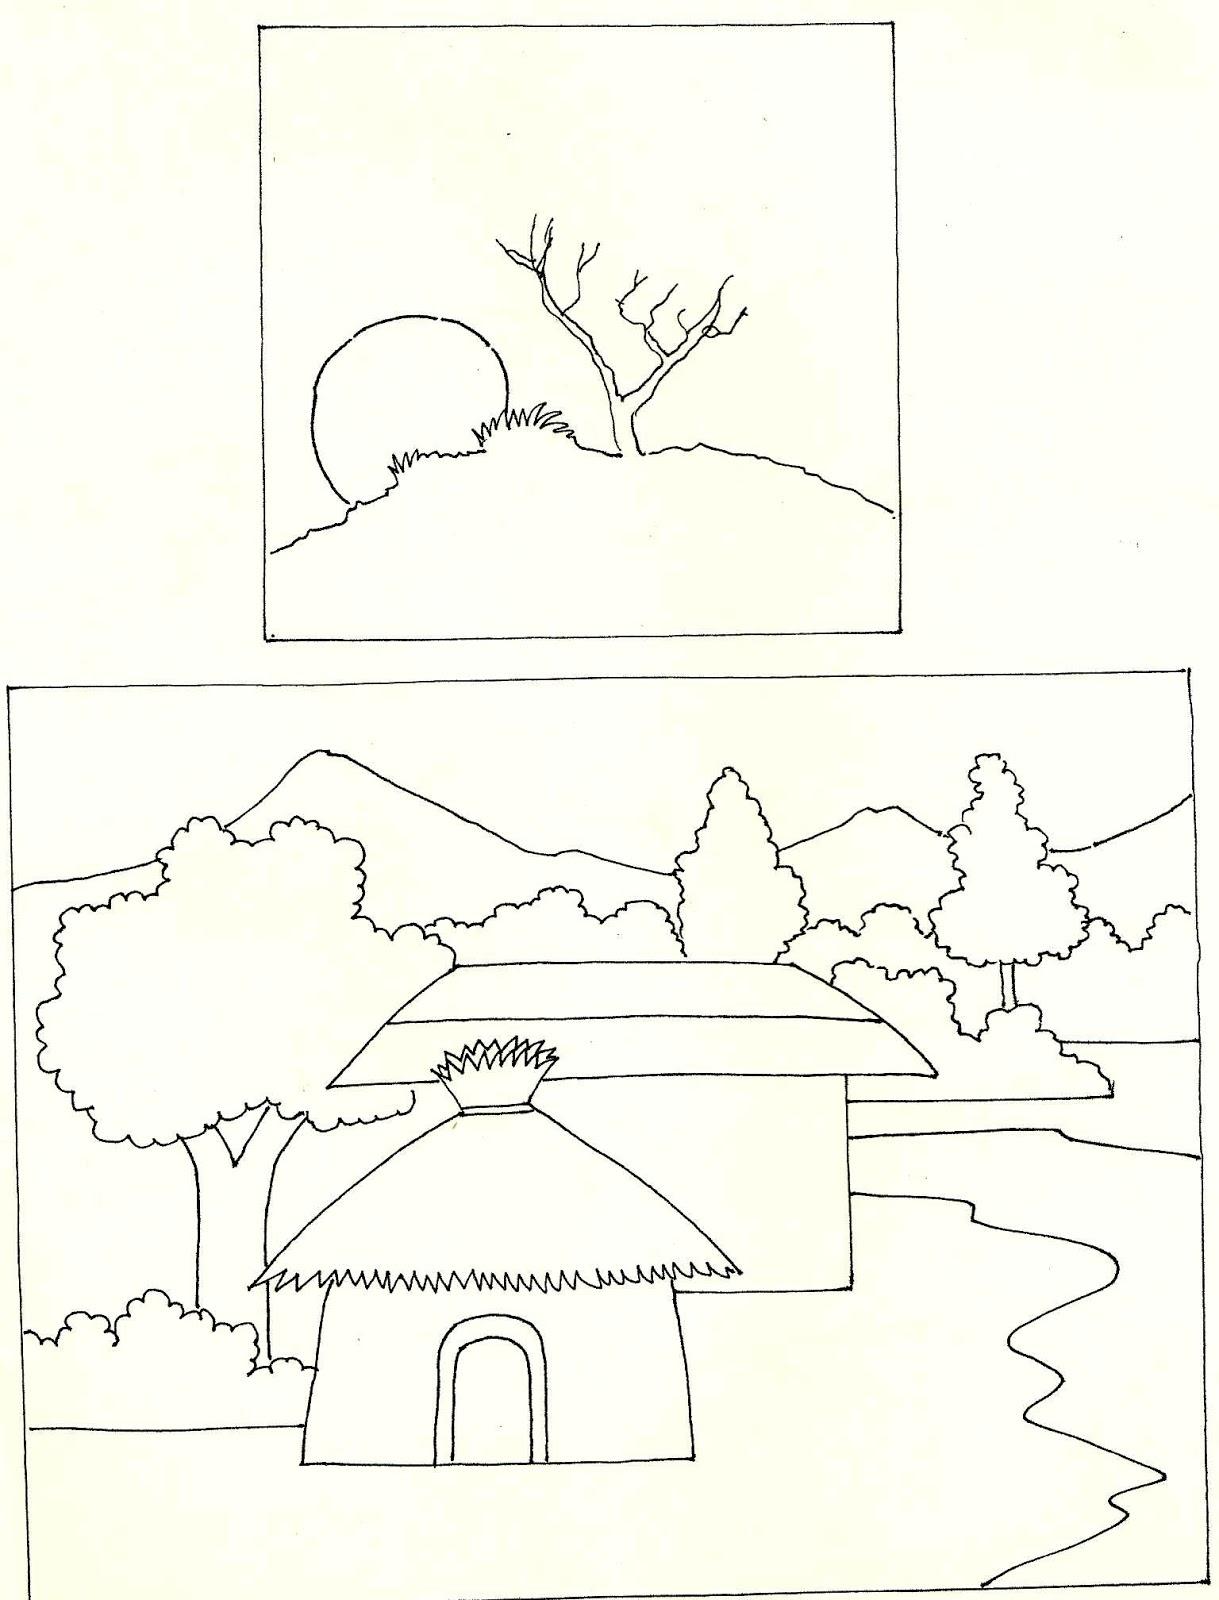 Studentsdrawing animal step by step easy outline drawing for Easy landscape drawings step by step